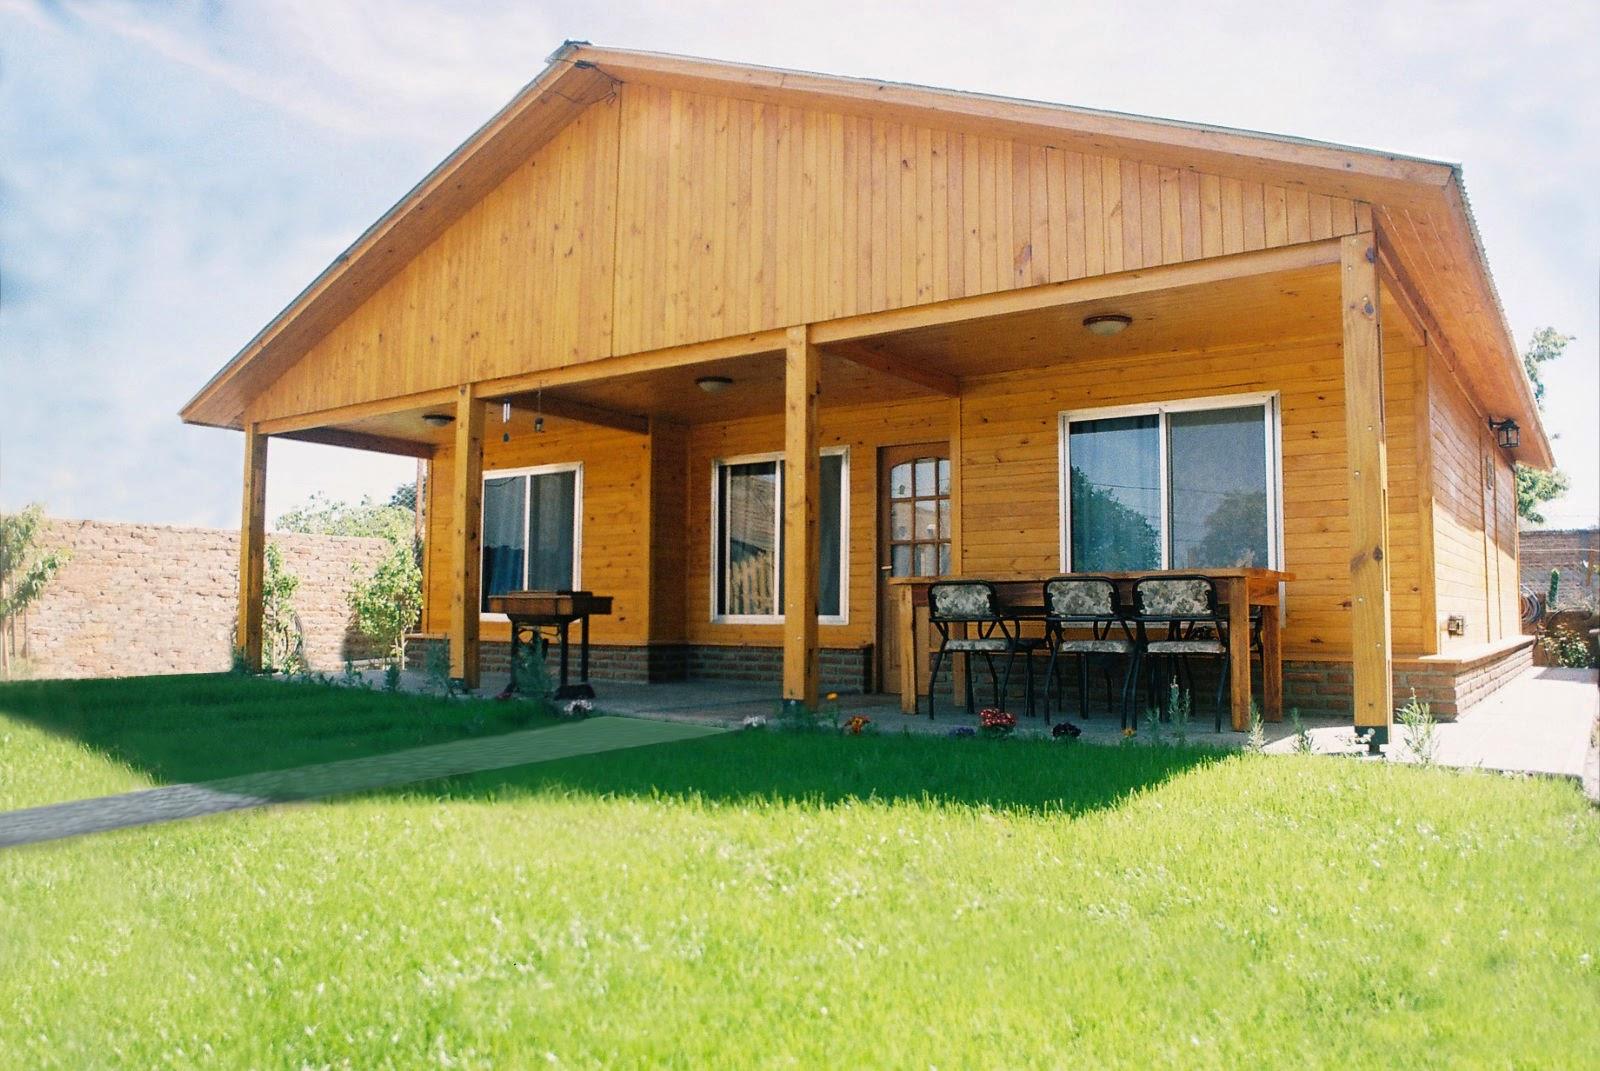 Arquitectura de casas modelos de casas prefabricadas - Casas madera economicas ...